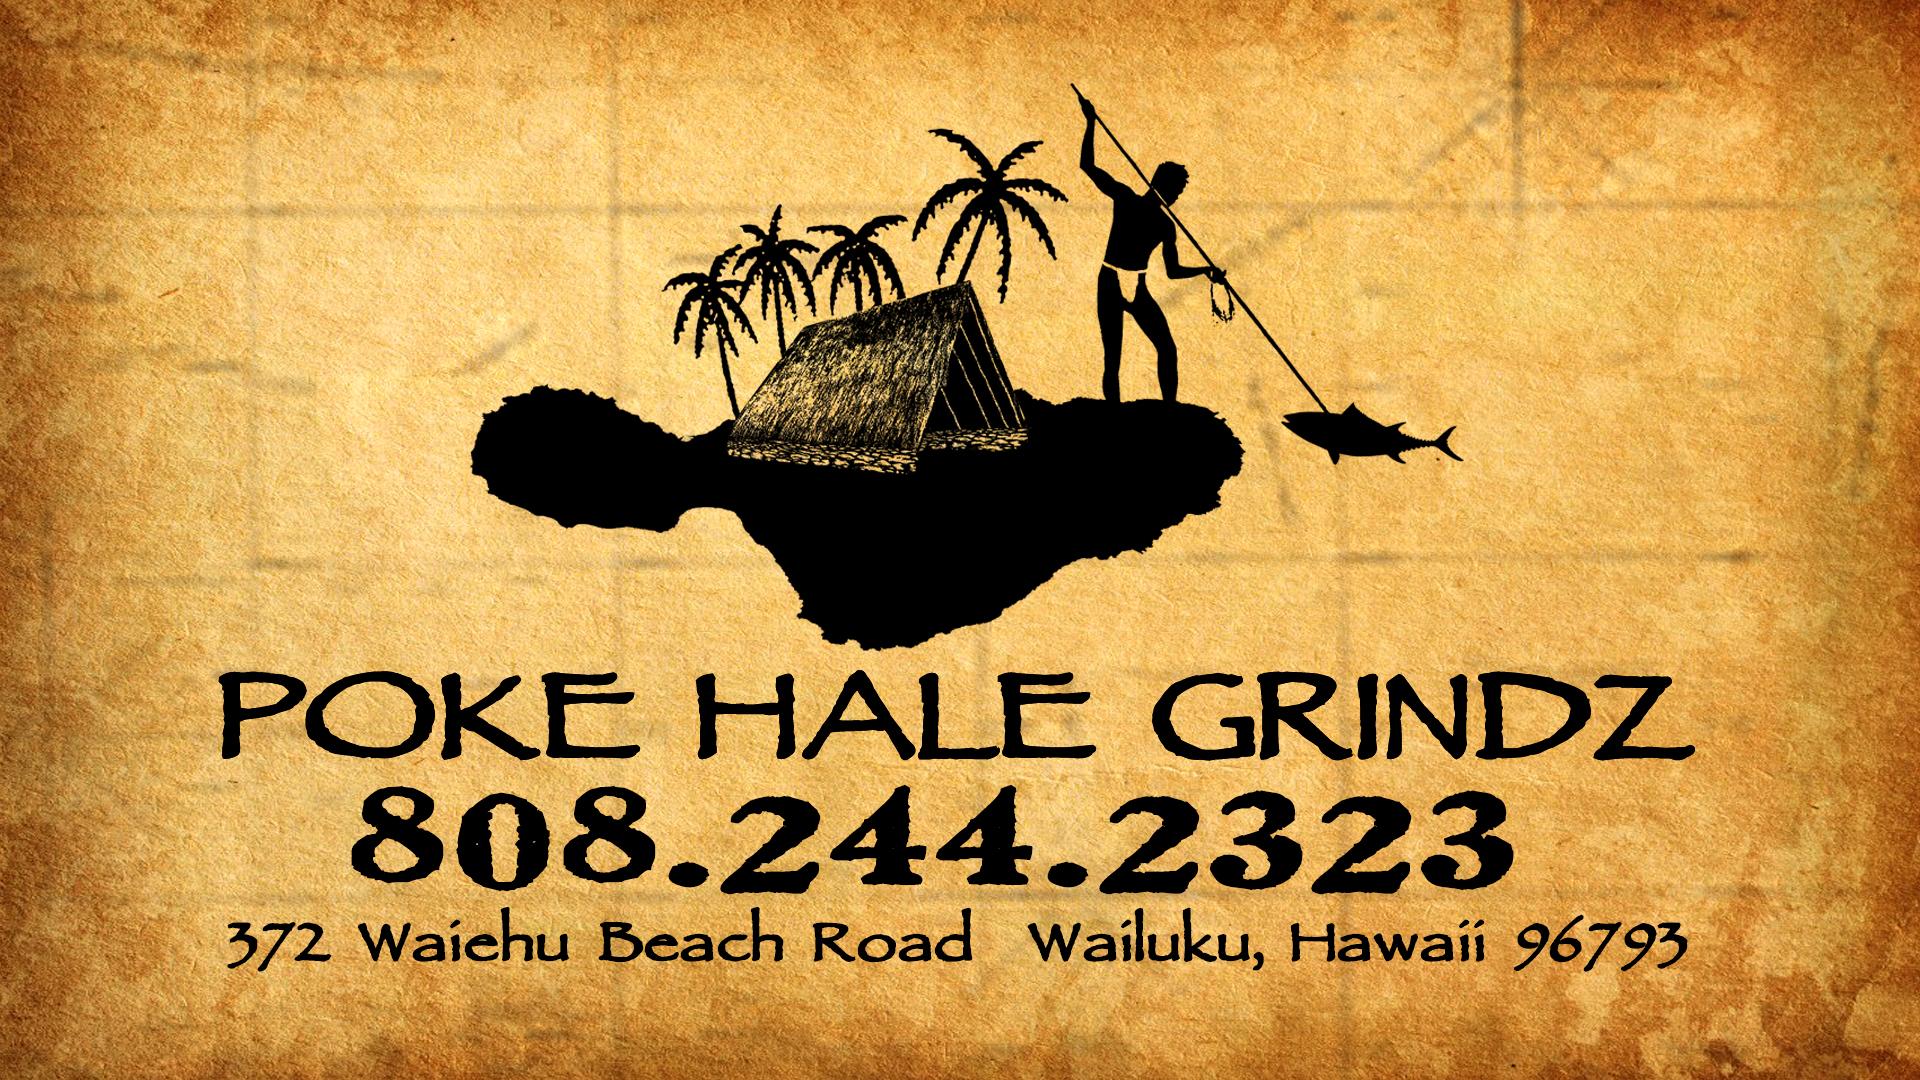 Poke Hale Grindz